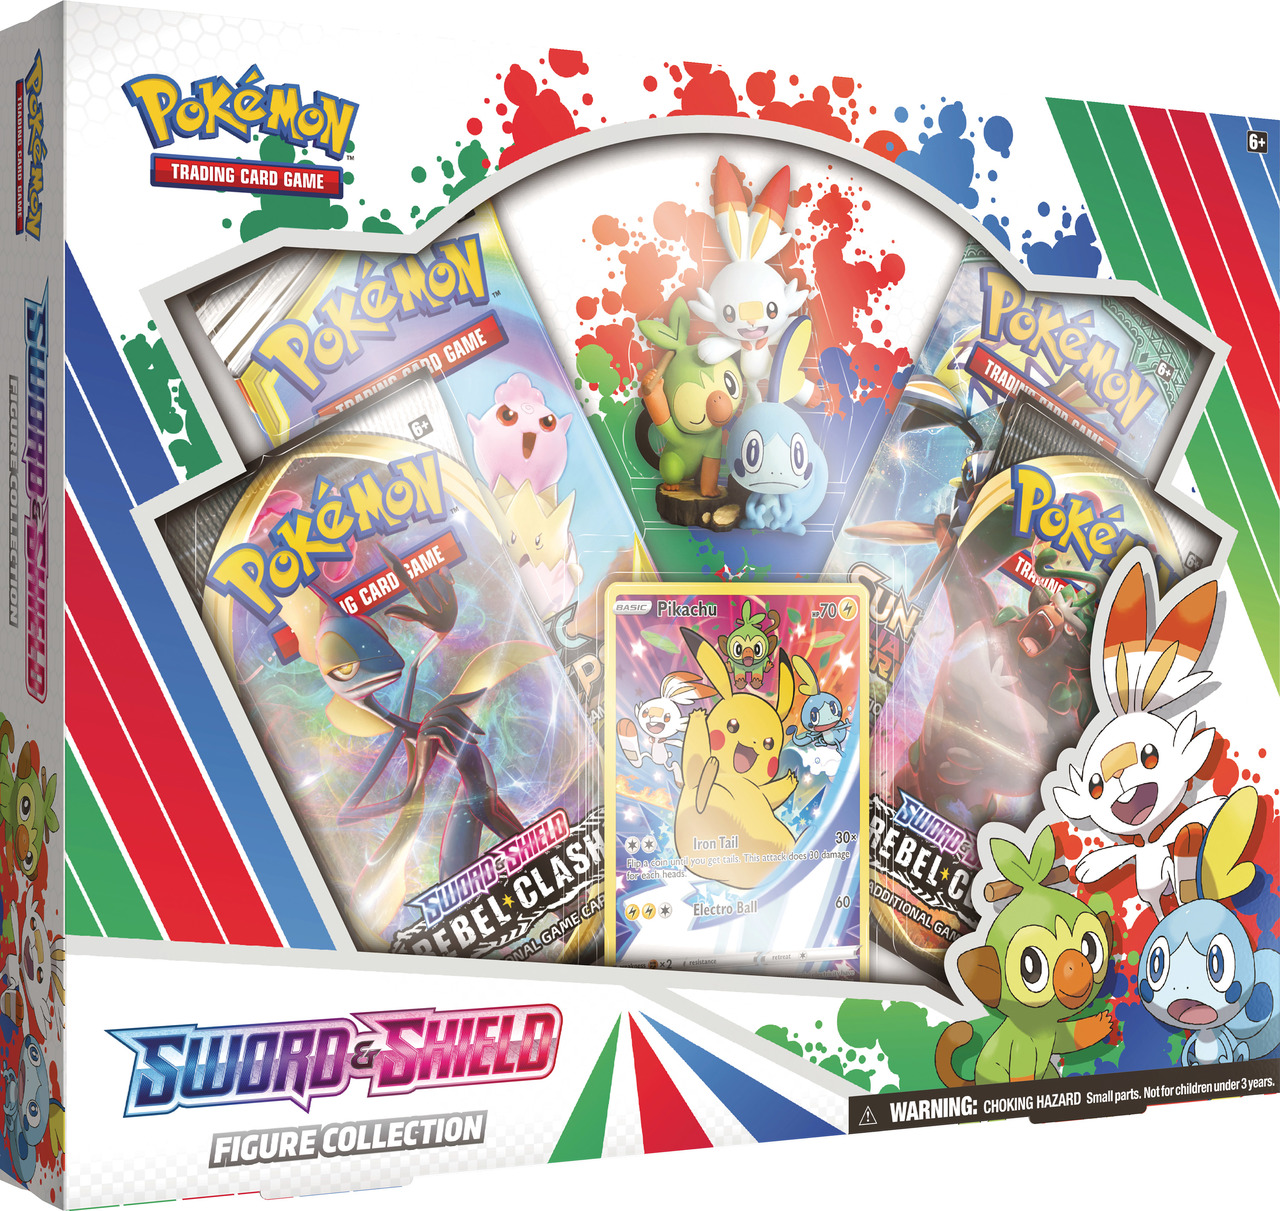 Pokemon Tcg: Sword & Shield Figure Collection